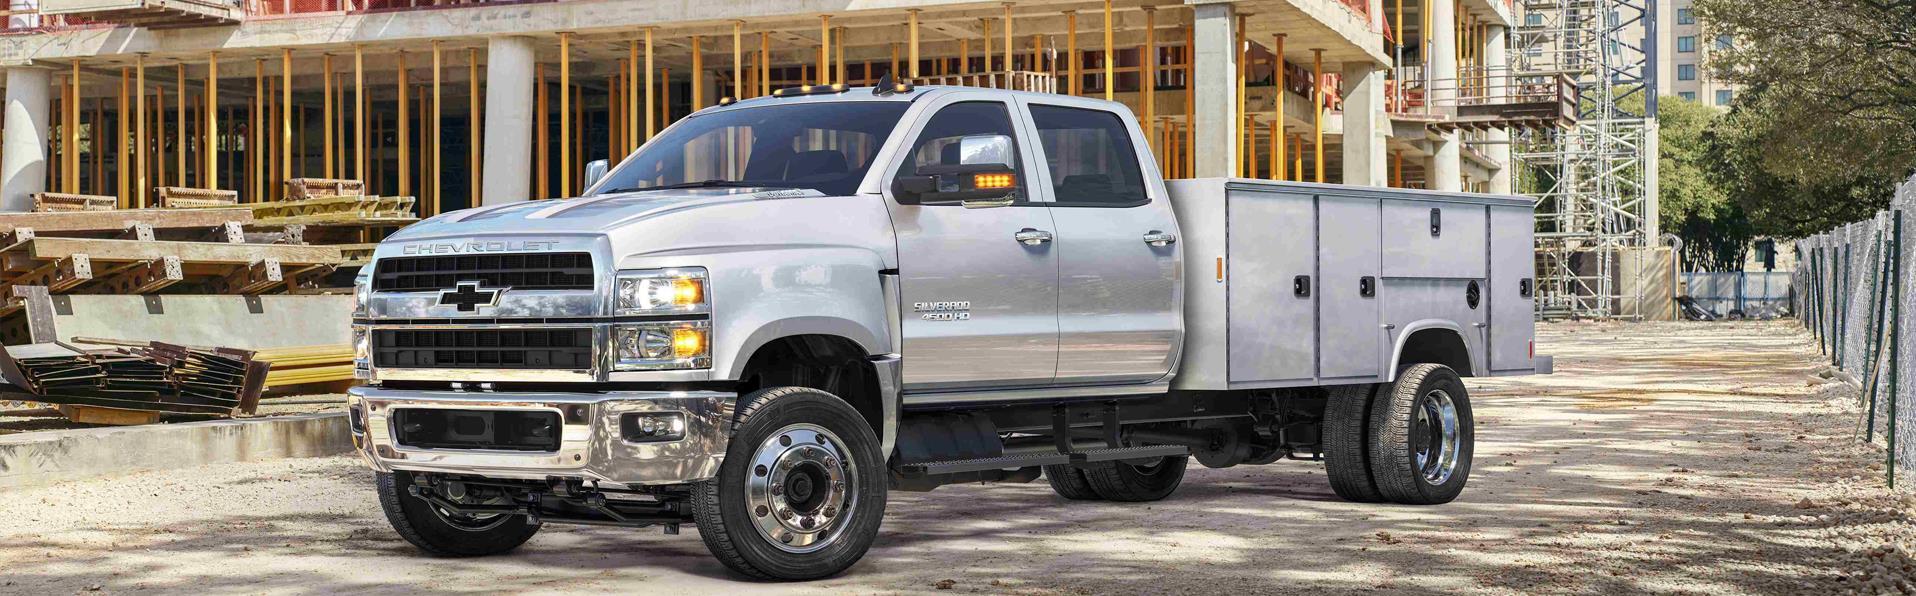 Used Cars Waco Tx >> Used Cars Waco Tx Used Cars Trucks Tx Fleet Plus Inc